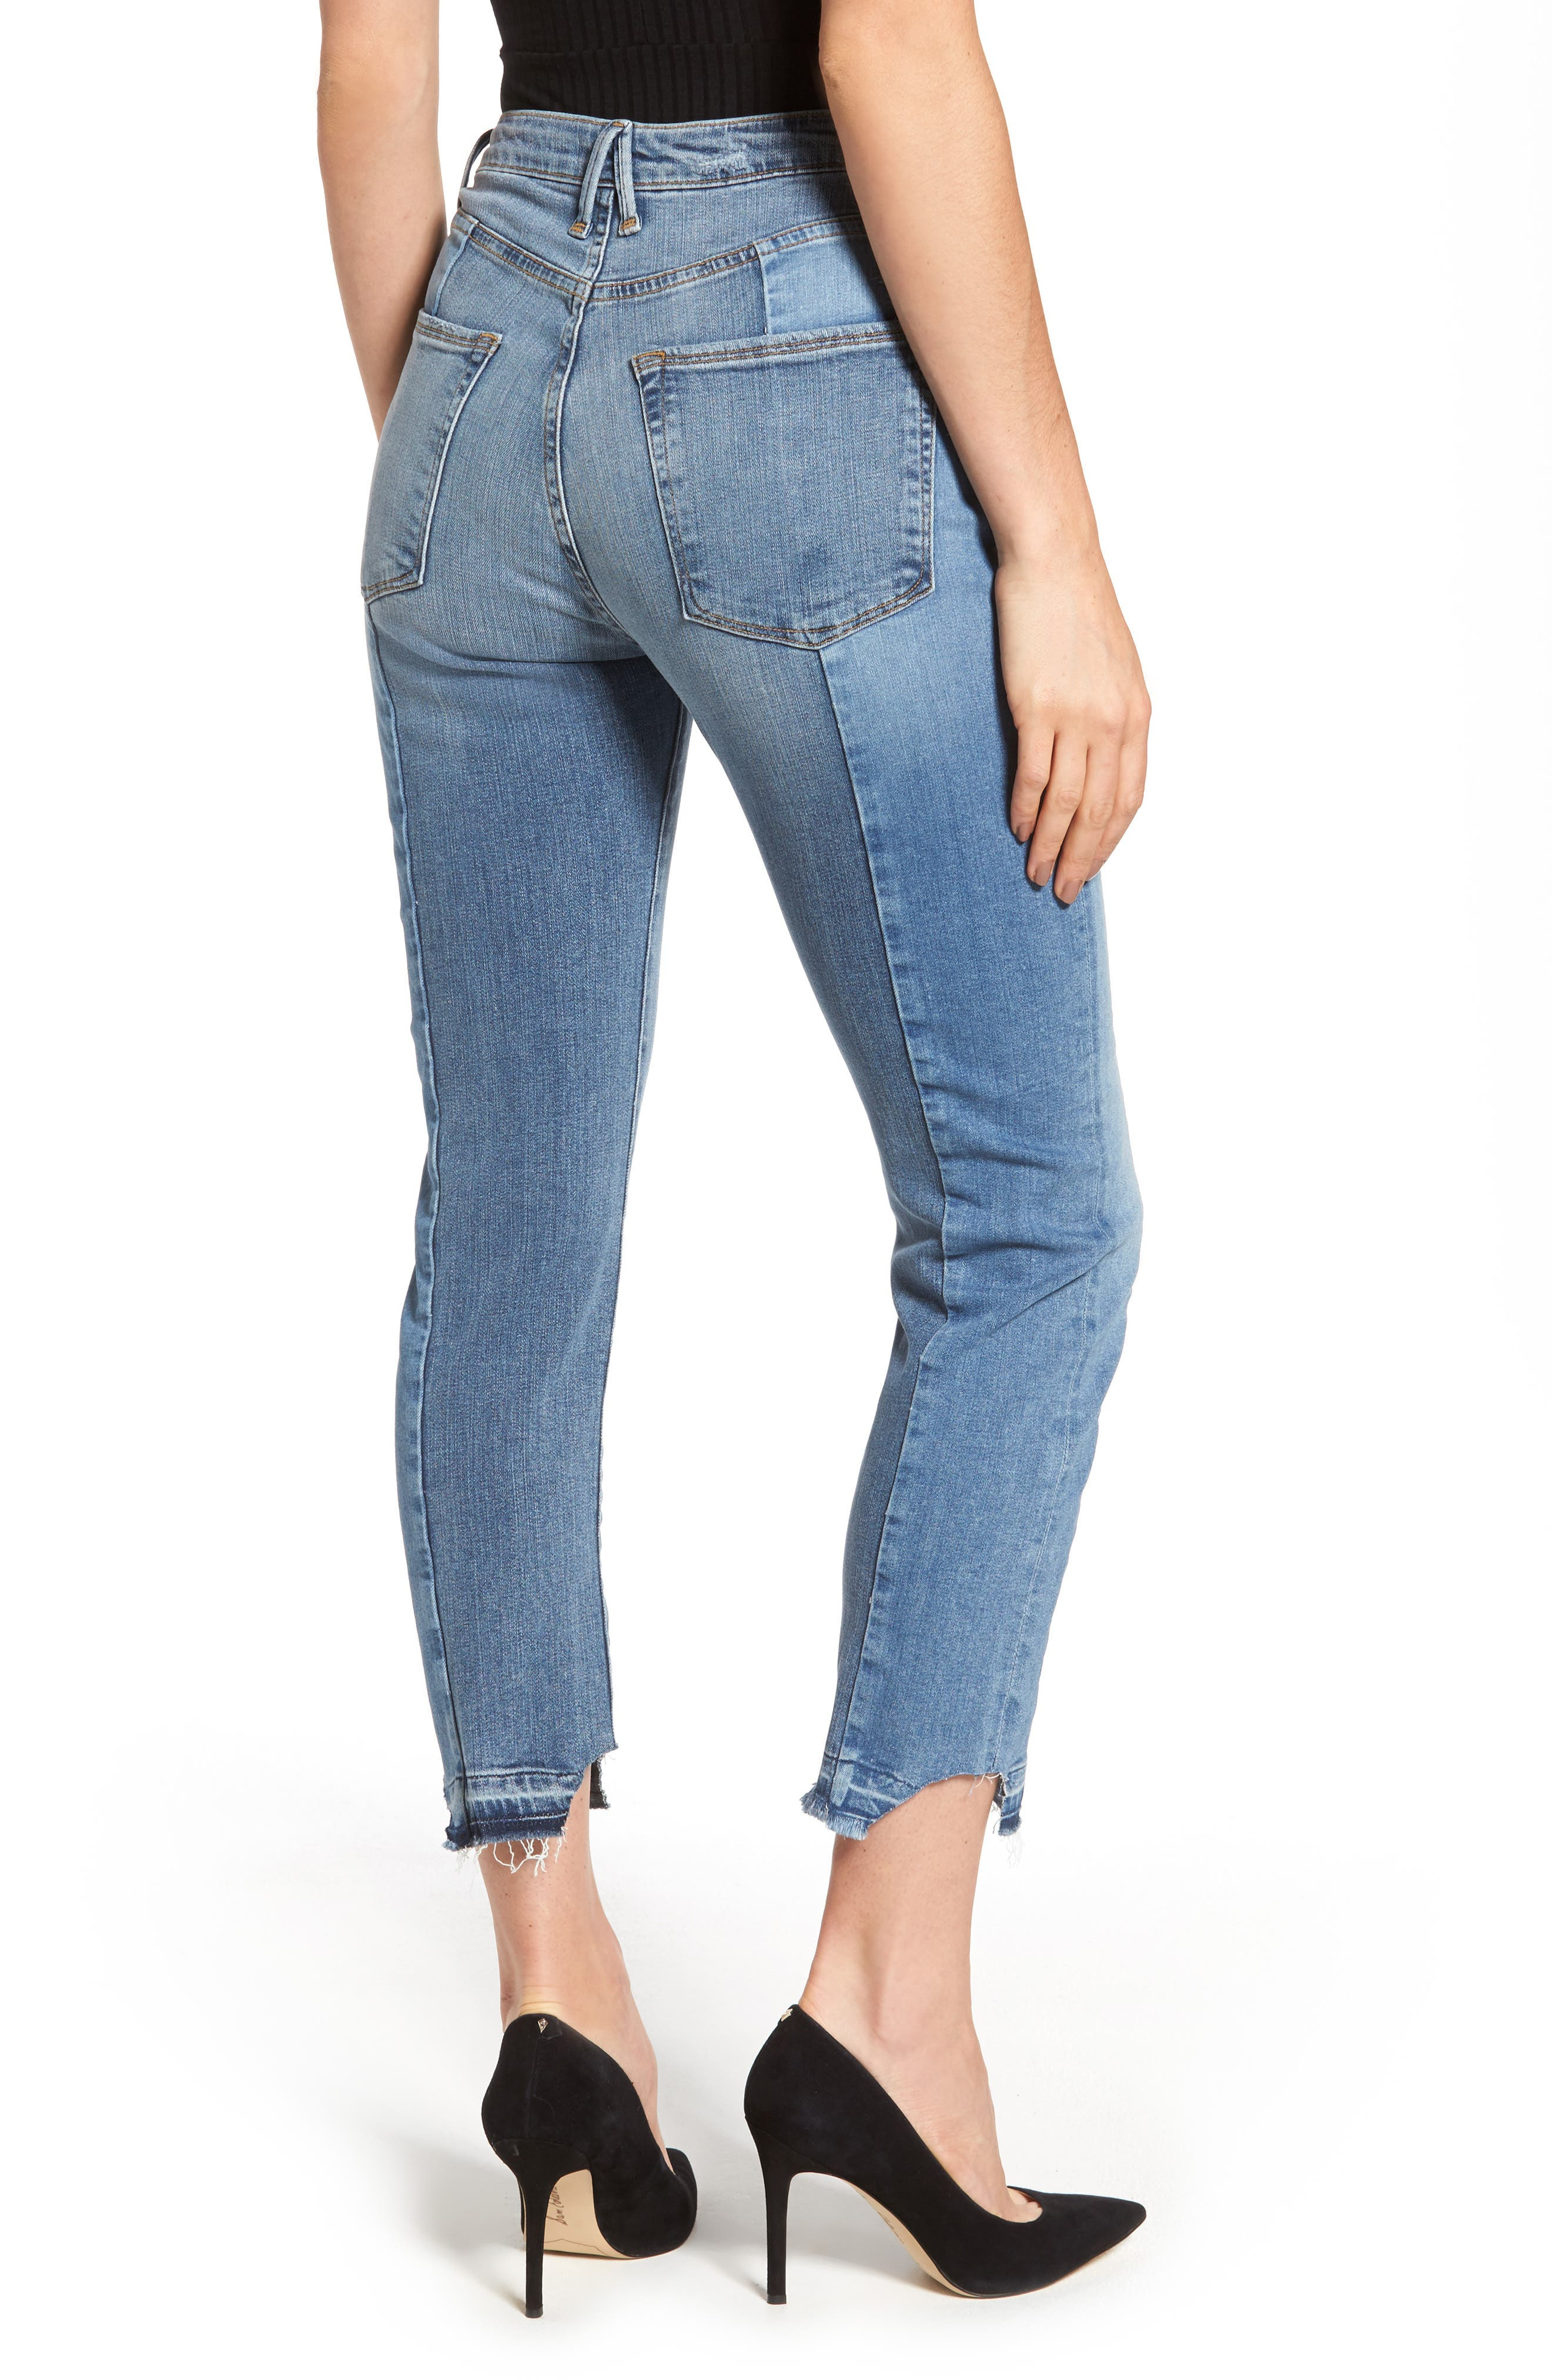 Alternate Image 2  - Good American Raw Hem High Waist Skinny Jeans (Blue 078) (Extended Sizes)